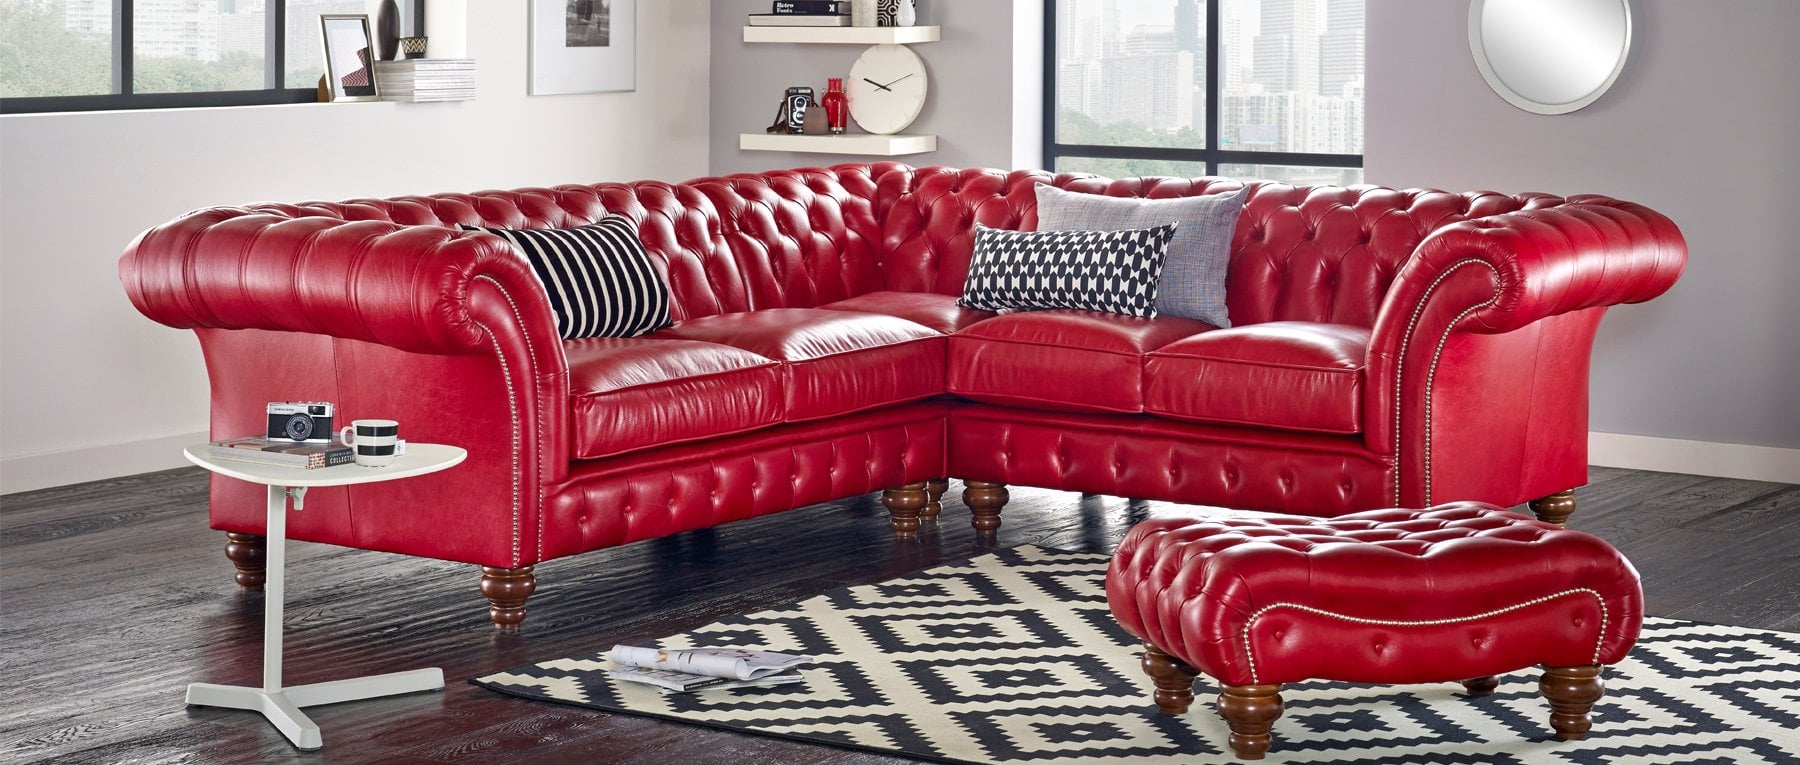 over 50 sofa designs